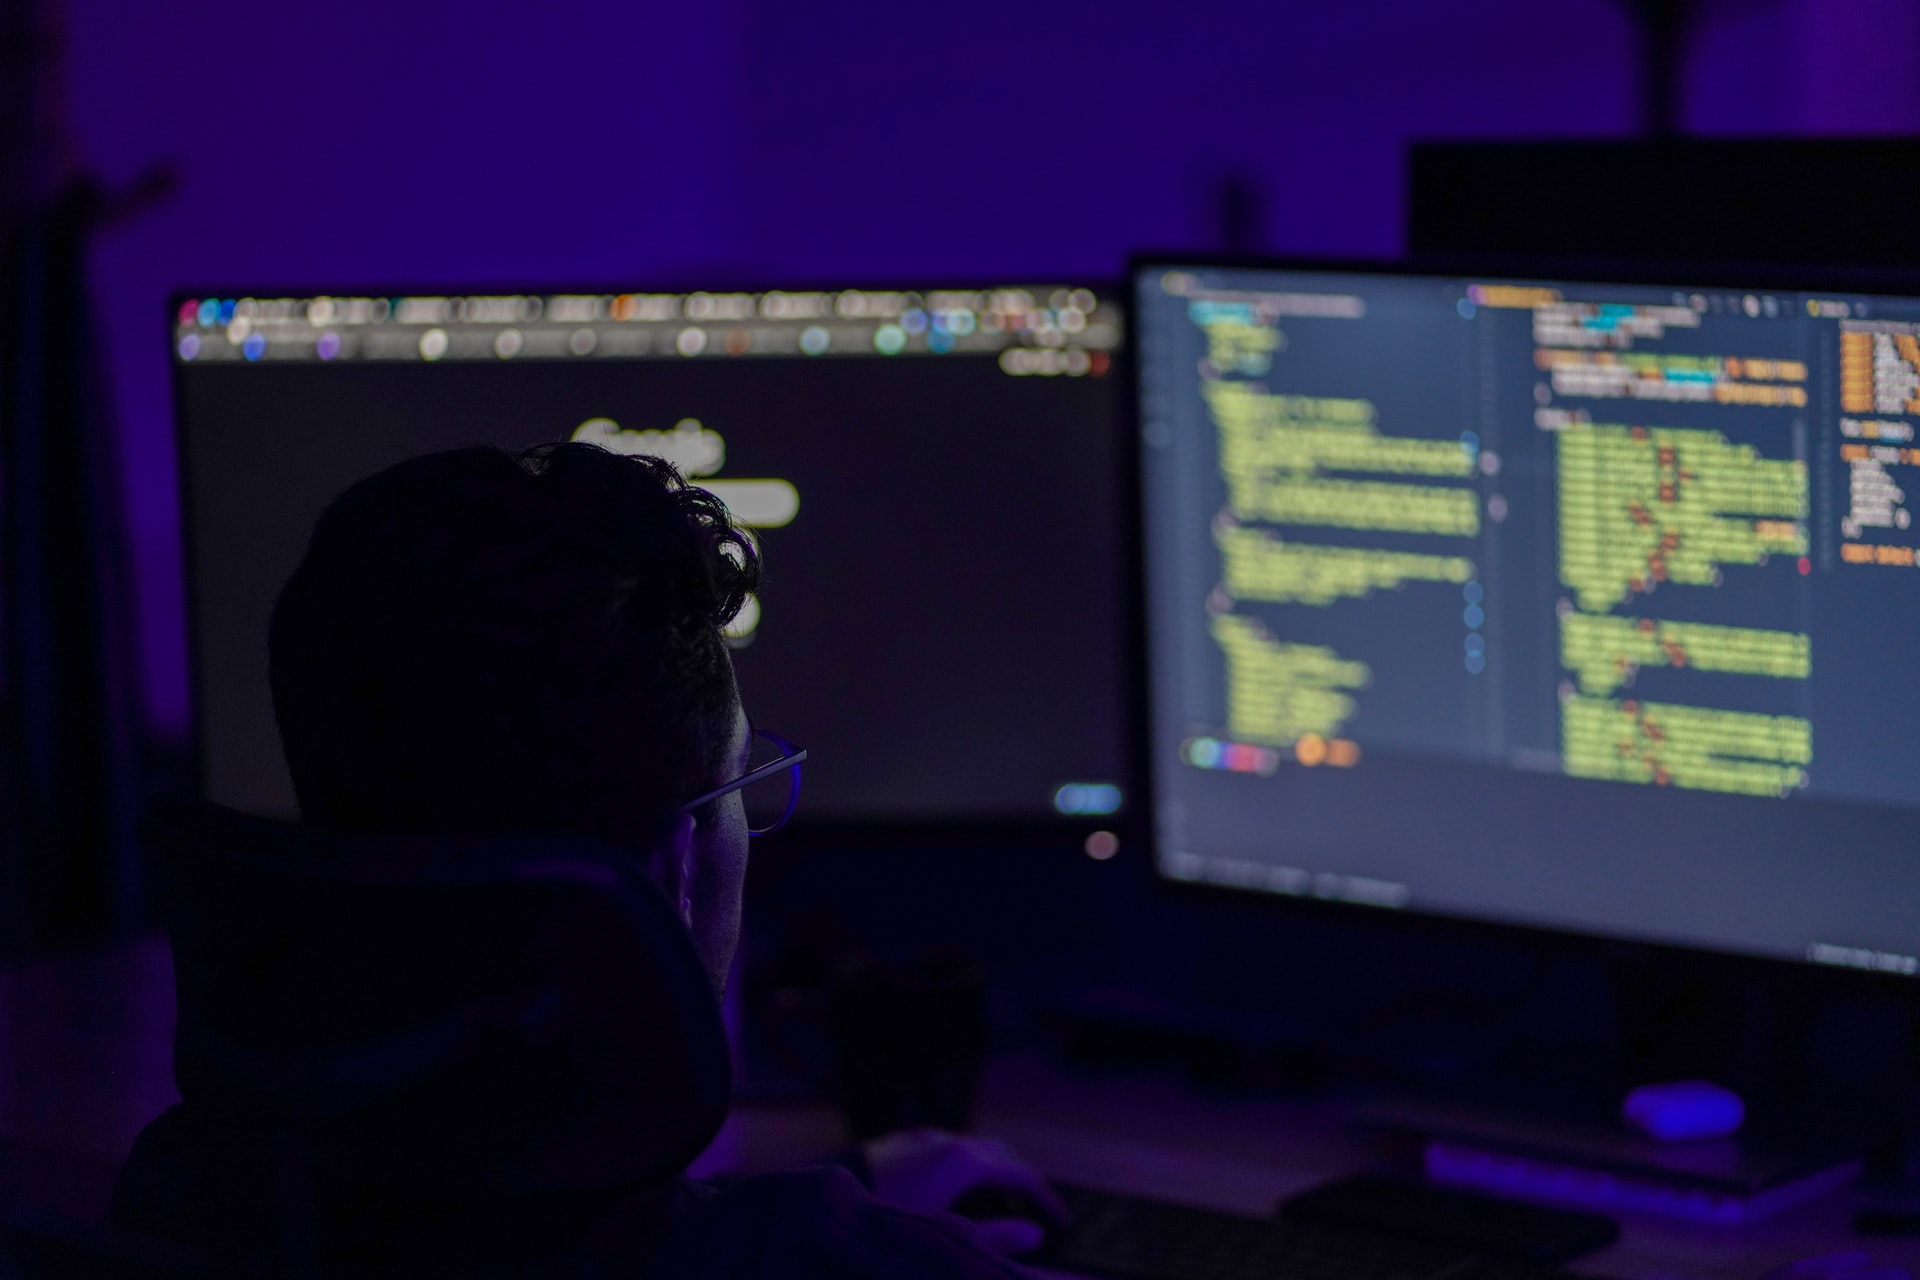 Cybersecurity Vector